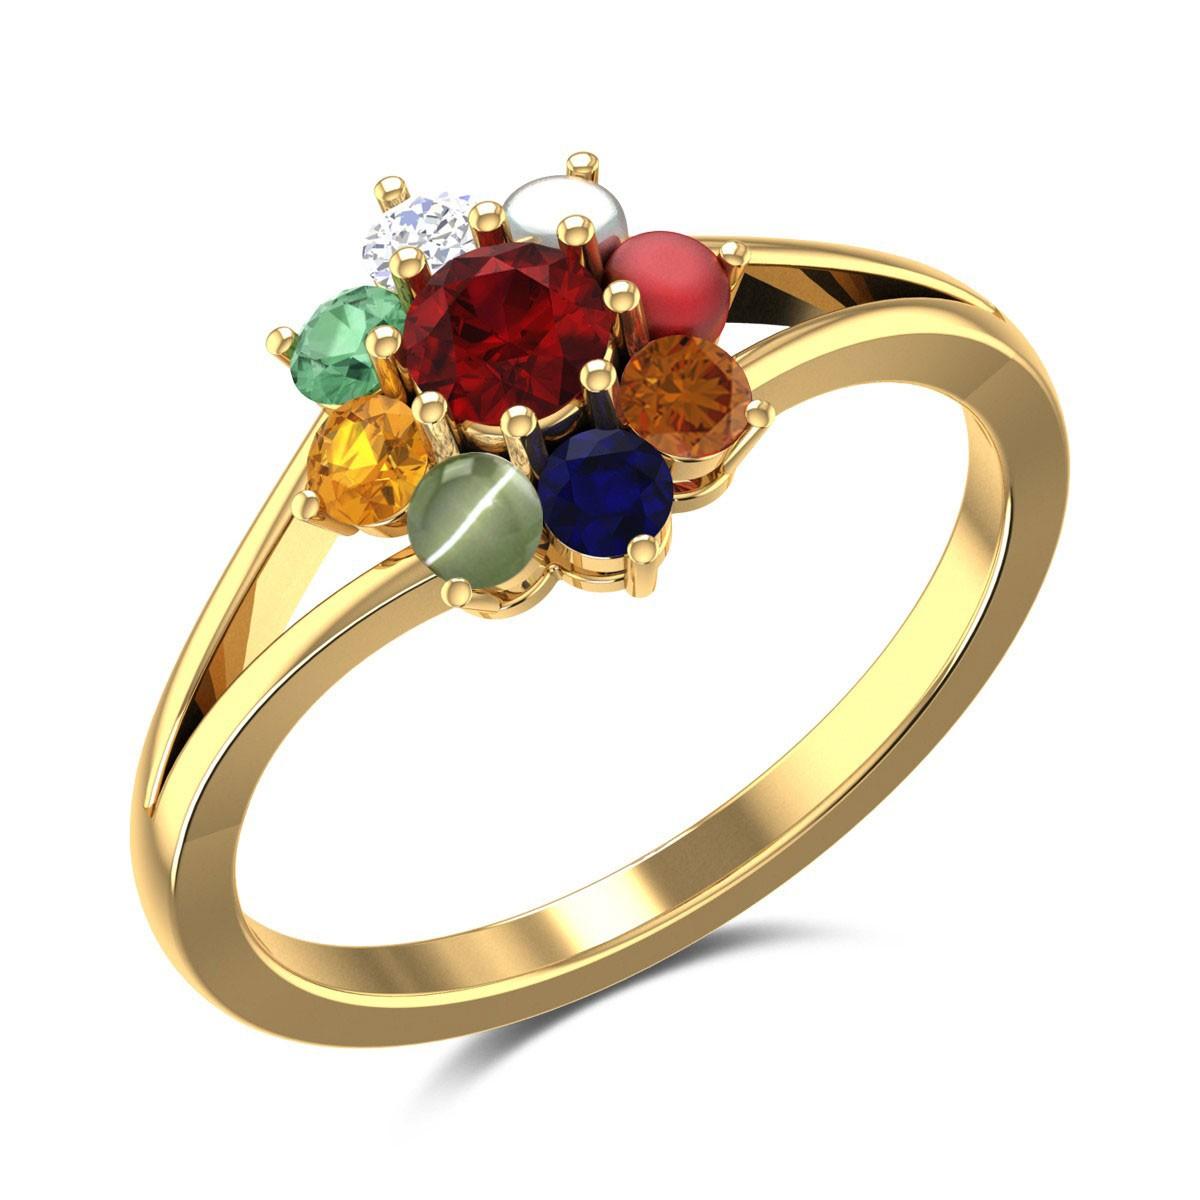 Teal Floral Navratna Ring